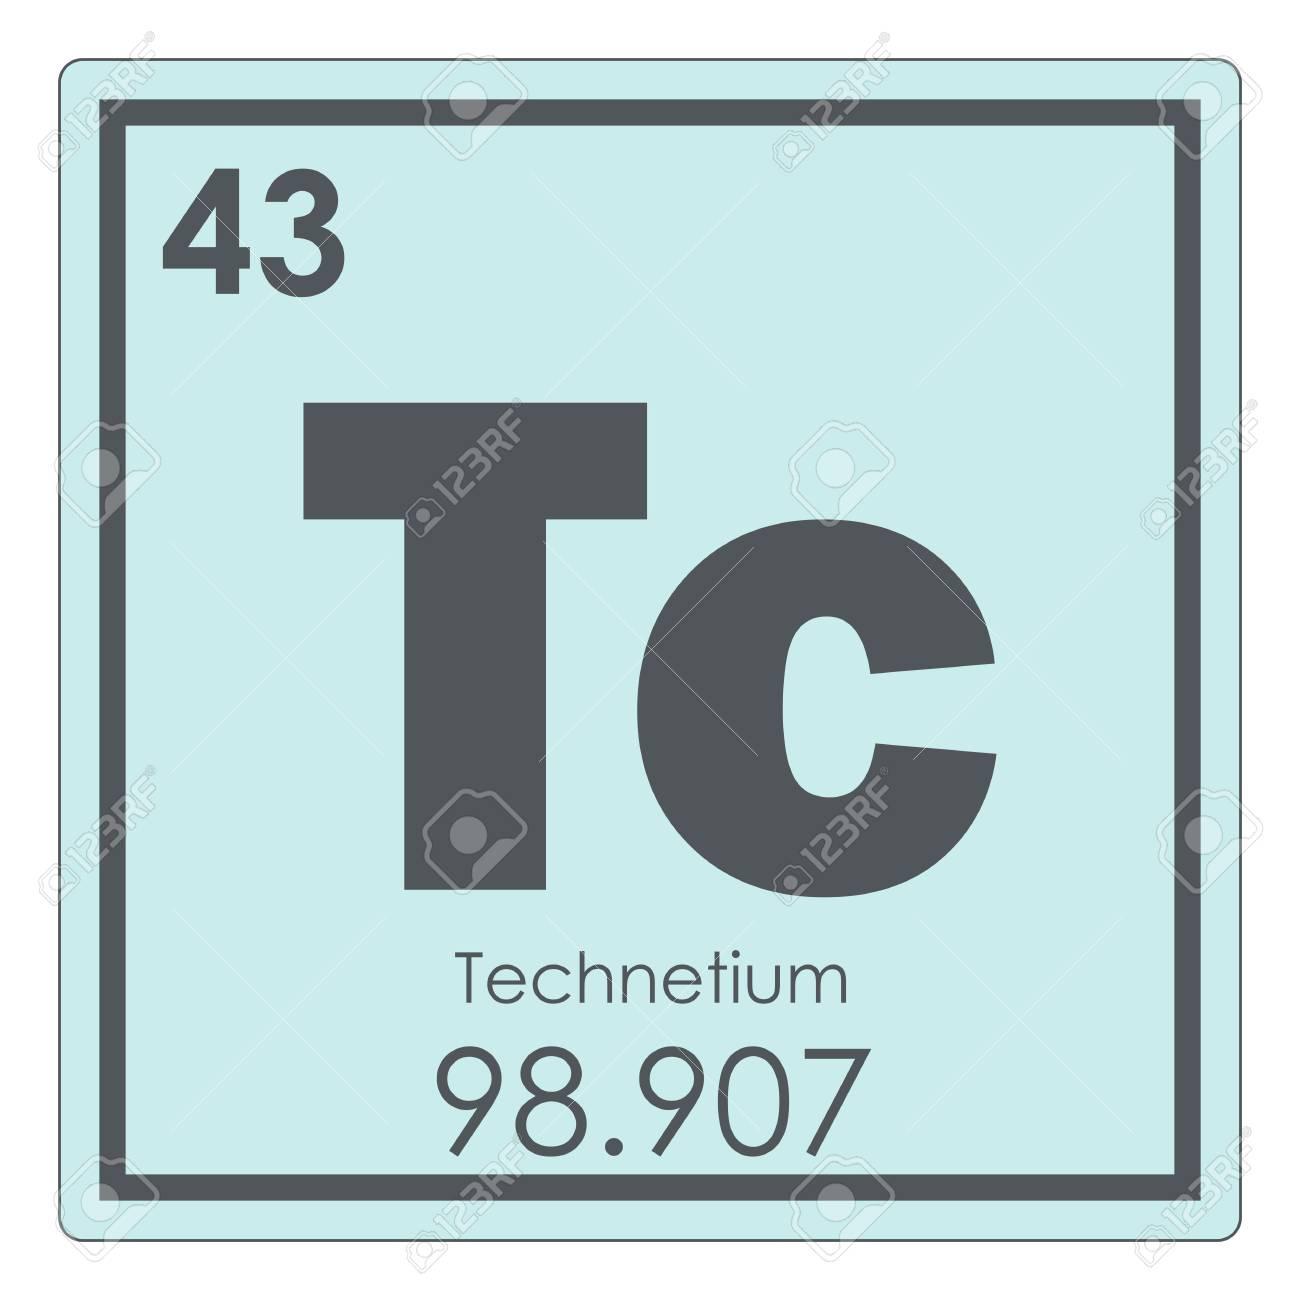 Technetium chemical element periodic table science symbol stock stock photo technetium chemical element periodic table science symbol urtaz Images